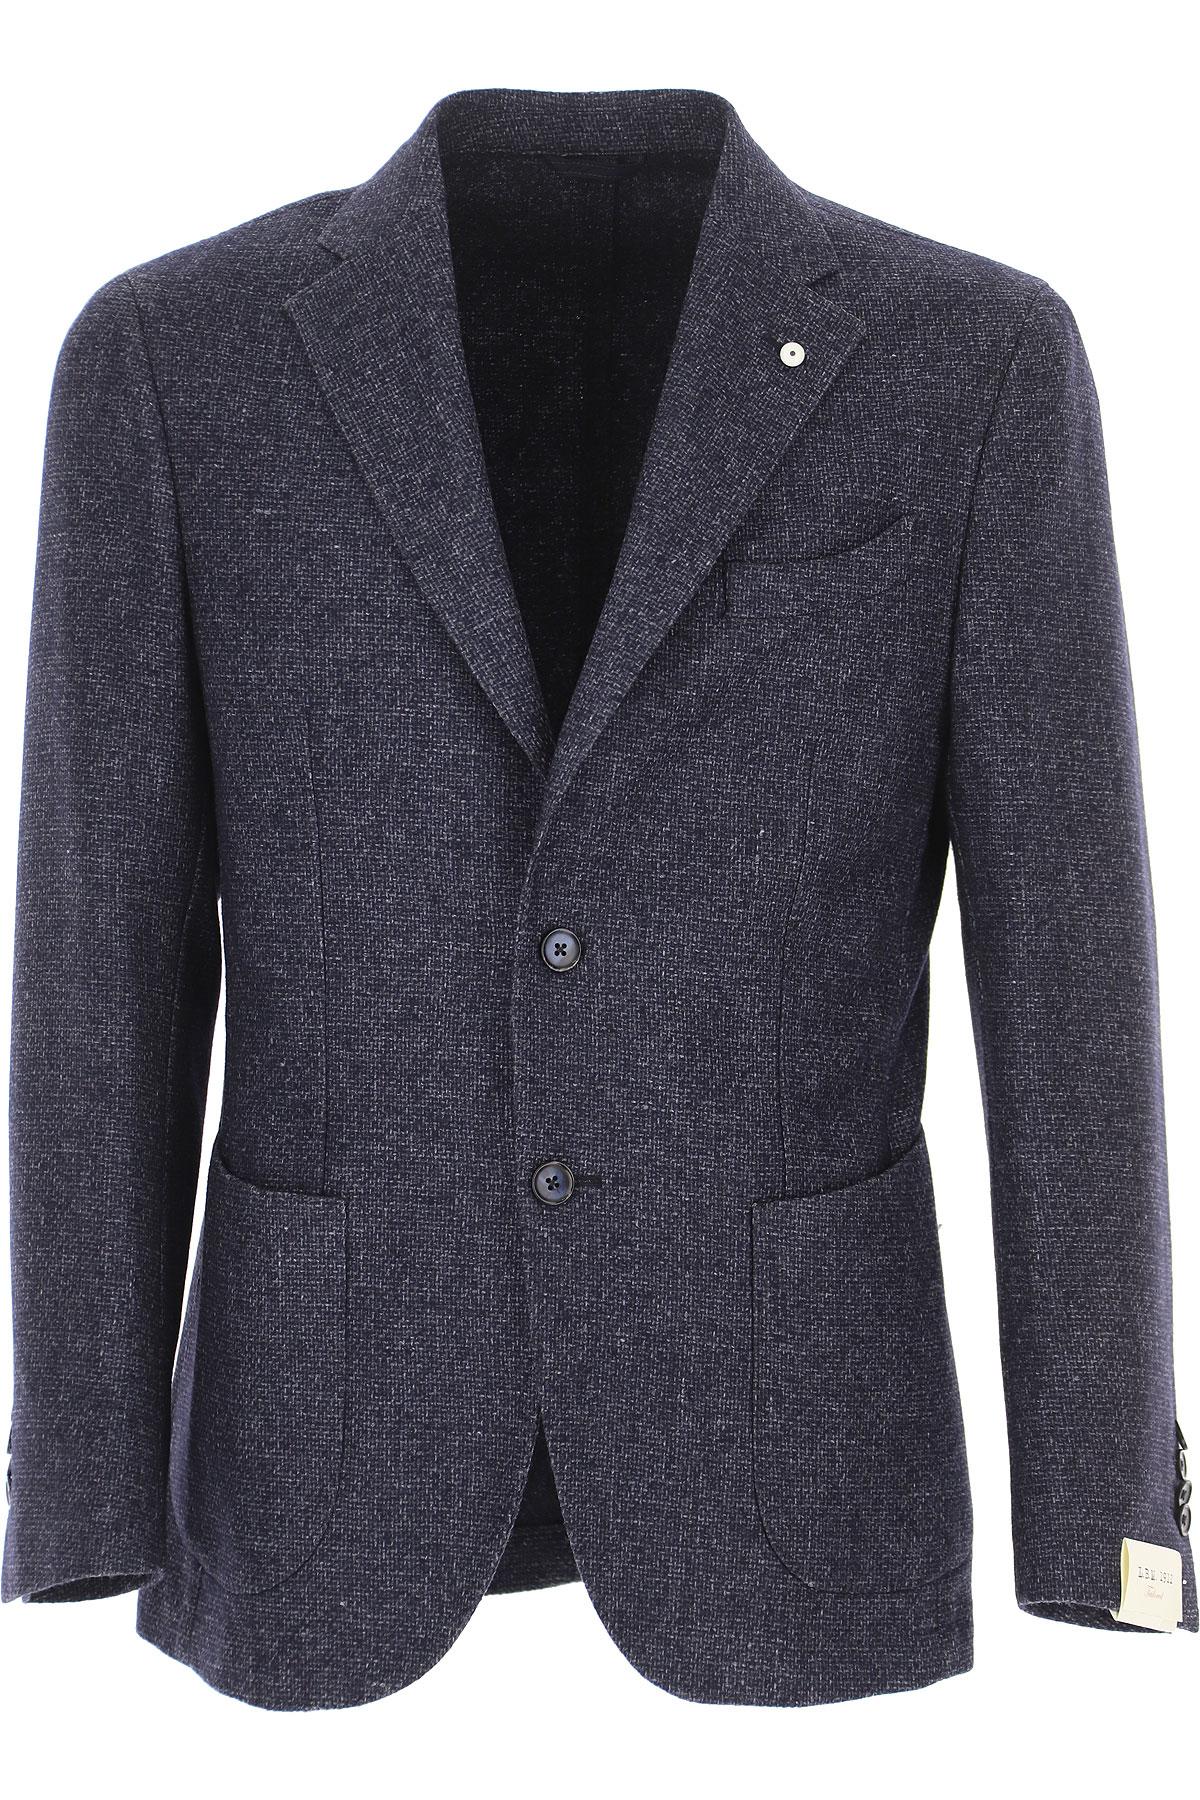 L.B.M. 1911 Blazer for Men, Sport Coat On Sale, Blue Melange, Wool, 2019, L M XXL